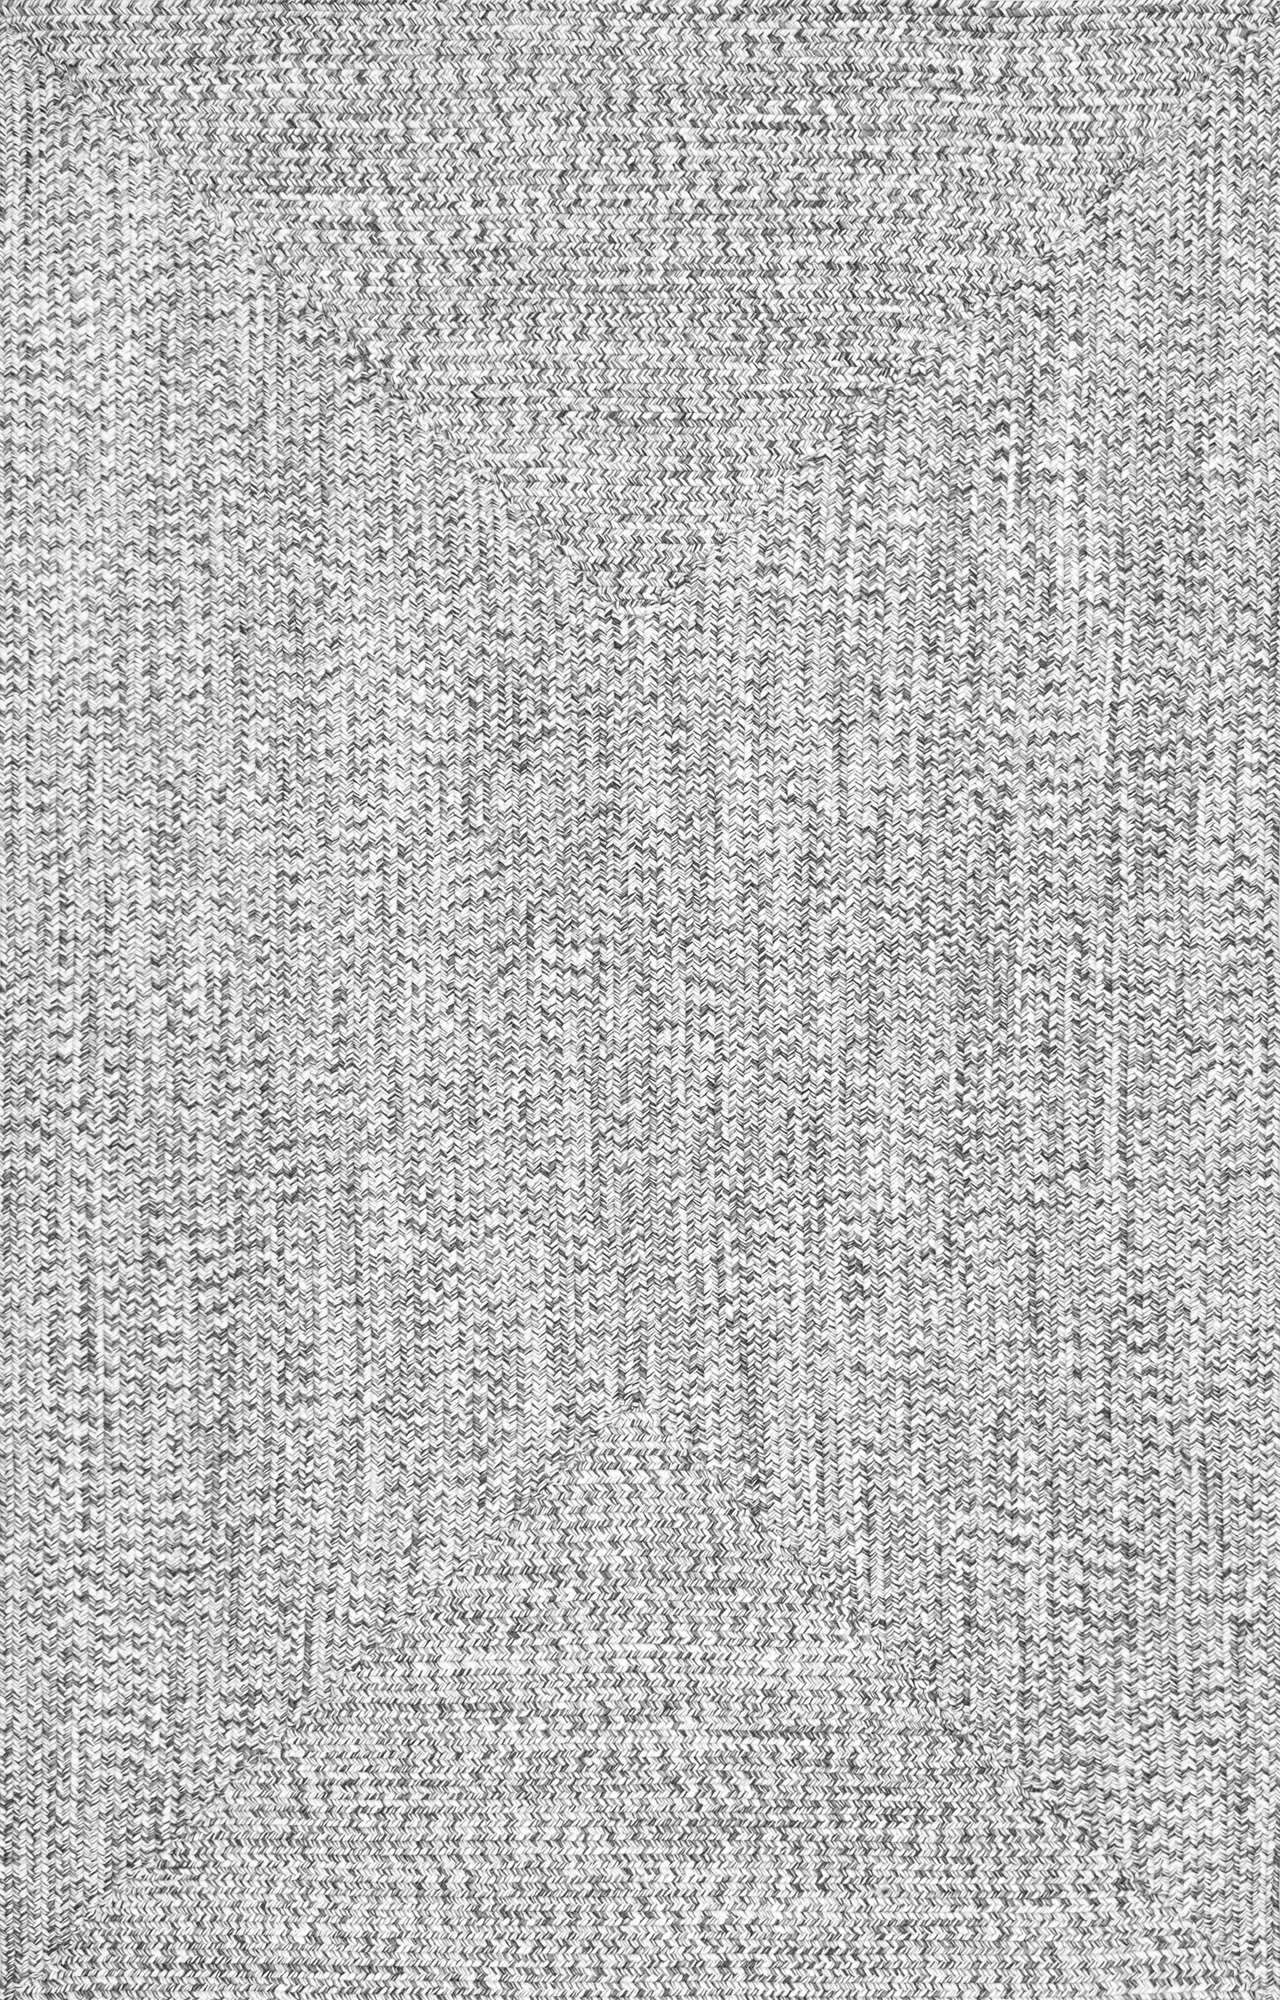 Nuloom Salt And Pepper Braided Lefebvre Hjfv01c Area Rug